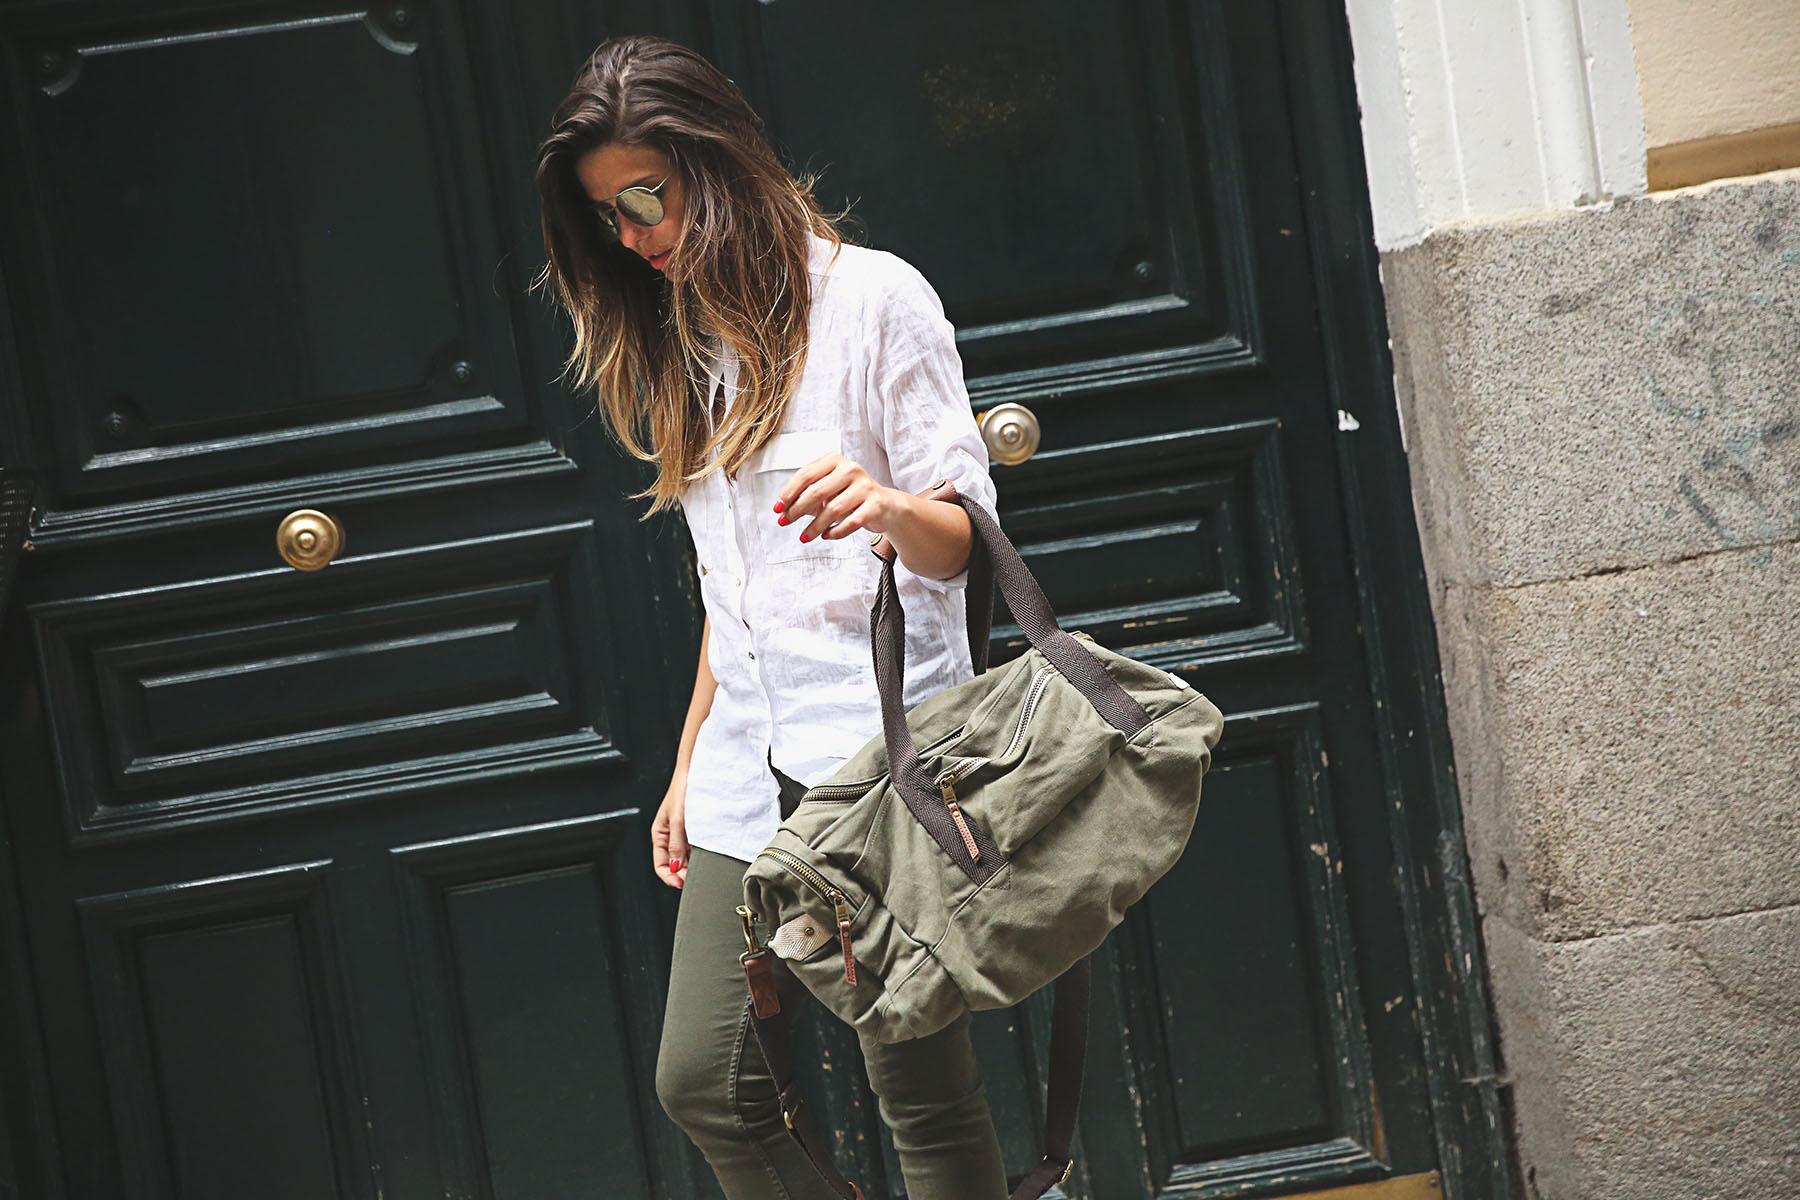 trendy-taste-look-outfit-street-style-steve-madden-ootd-blog-blogger-fashion-spain-moda-españa-safari-traveling-viaje-bolsa-bag-khaki-caqui-pants-sandalias-zuecos-1